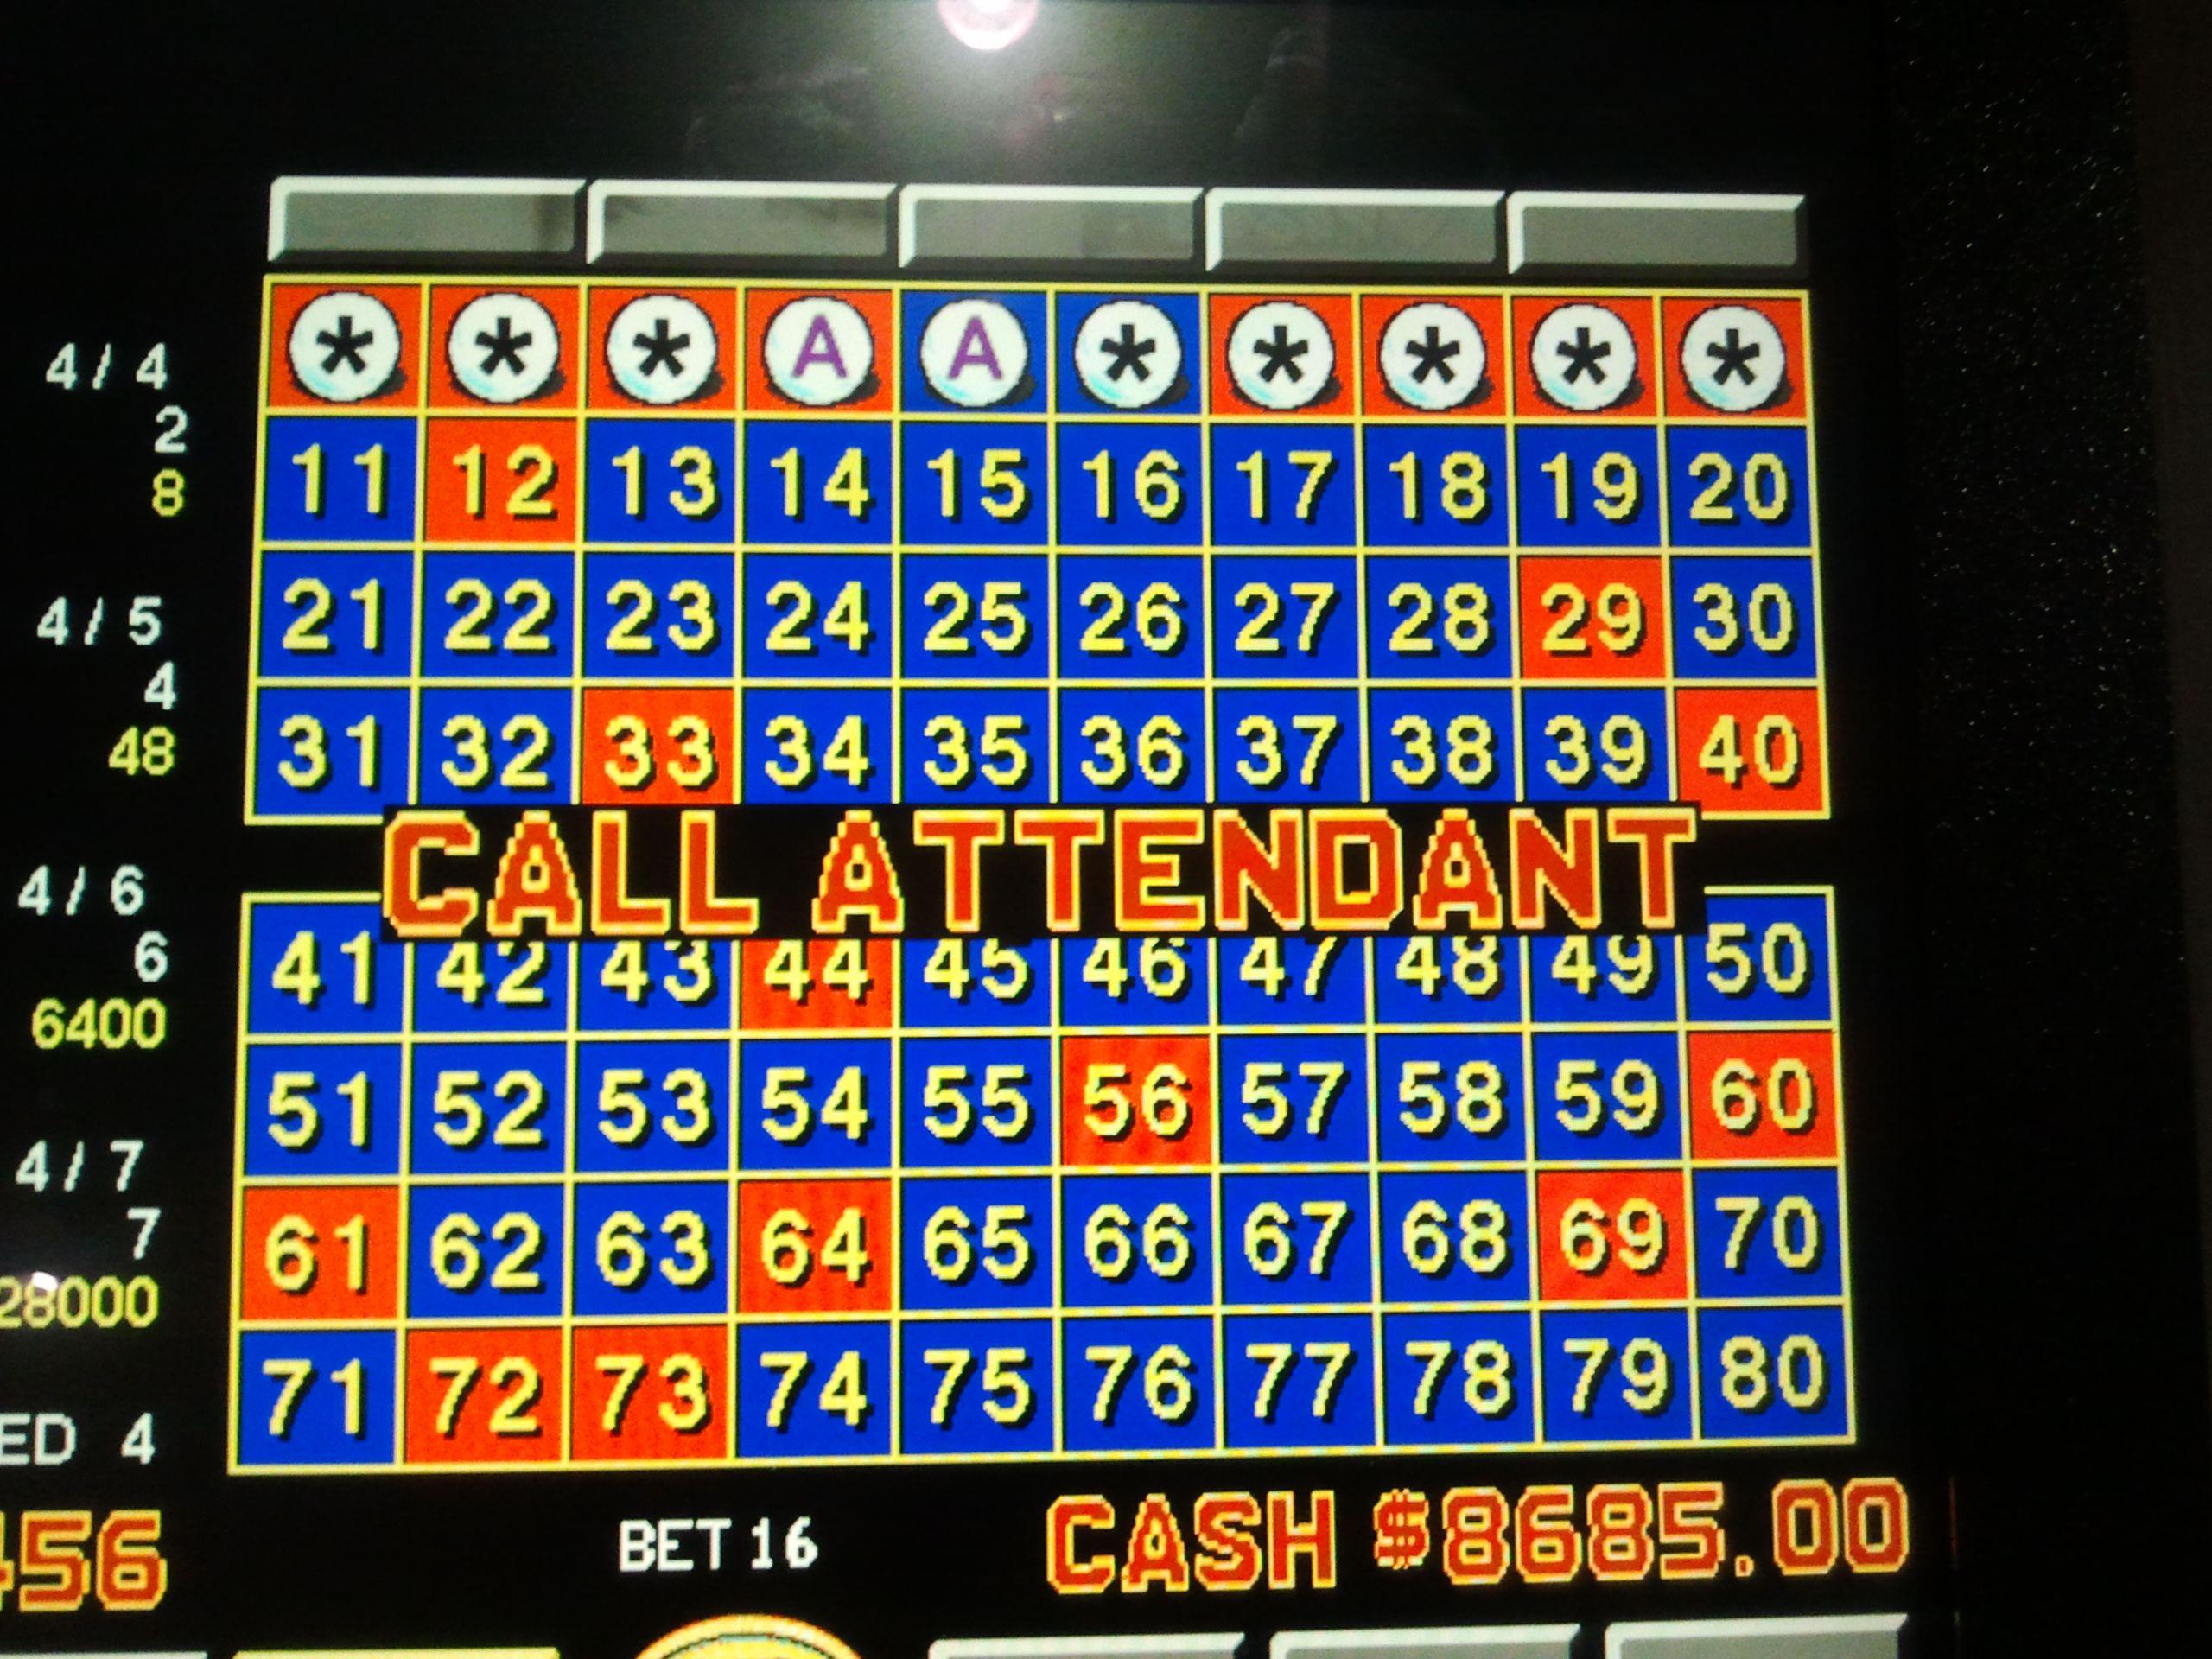 Keno 7 spot for 8k casino jackpot bonus